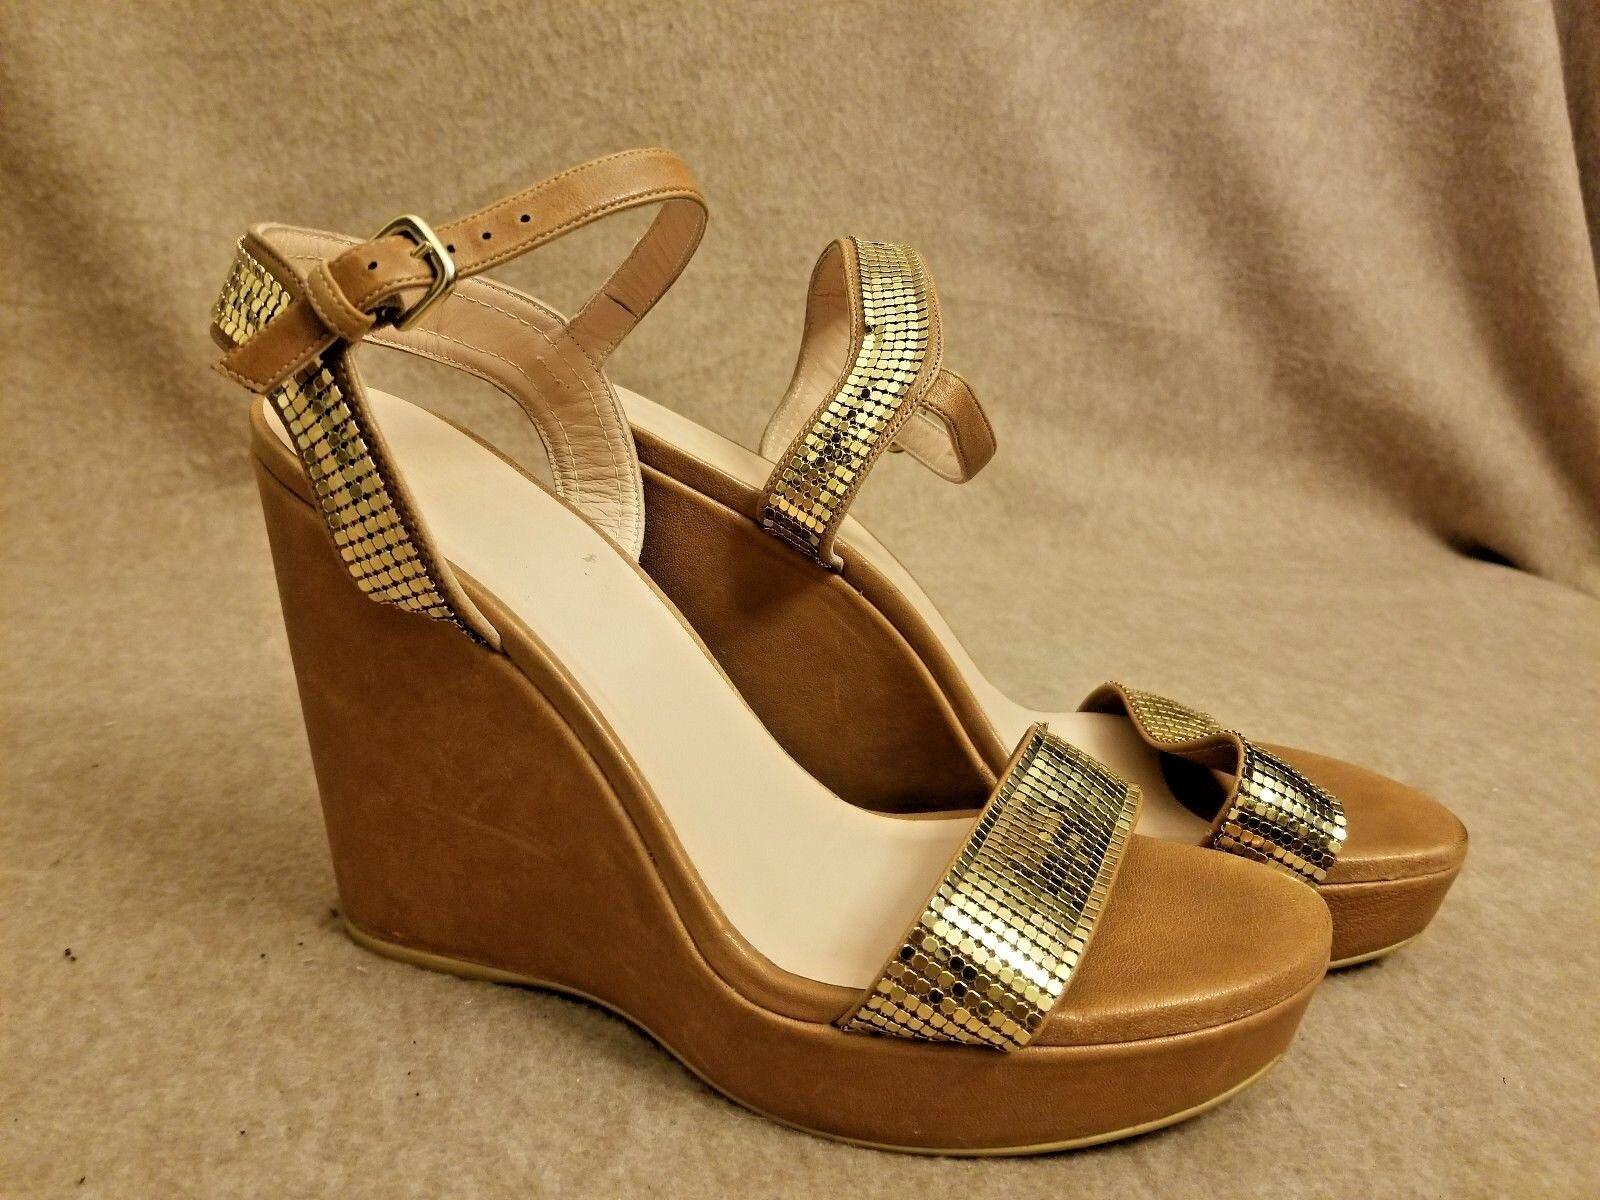 Stuart Weitzman Damens Schuhes Platform Gold Roman Pumps Sandales Wedges Größe 40